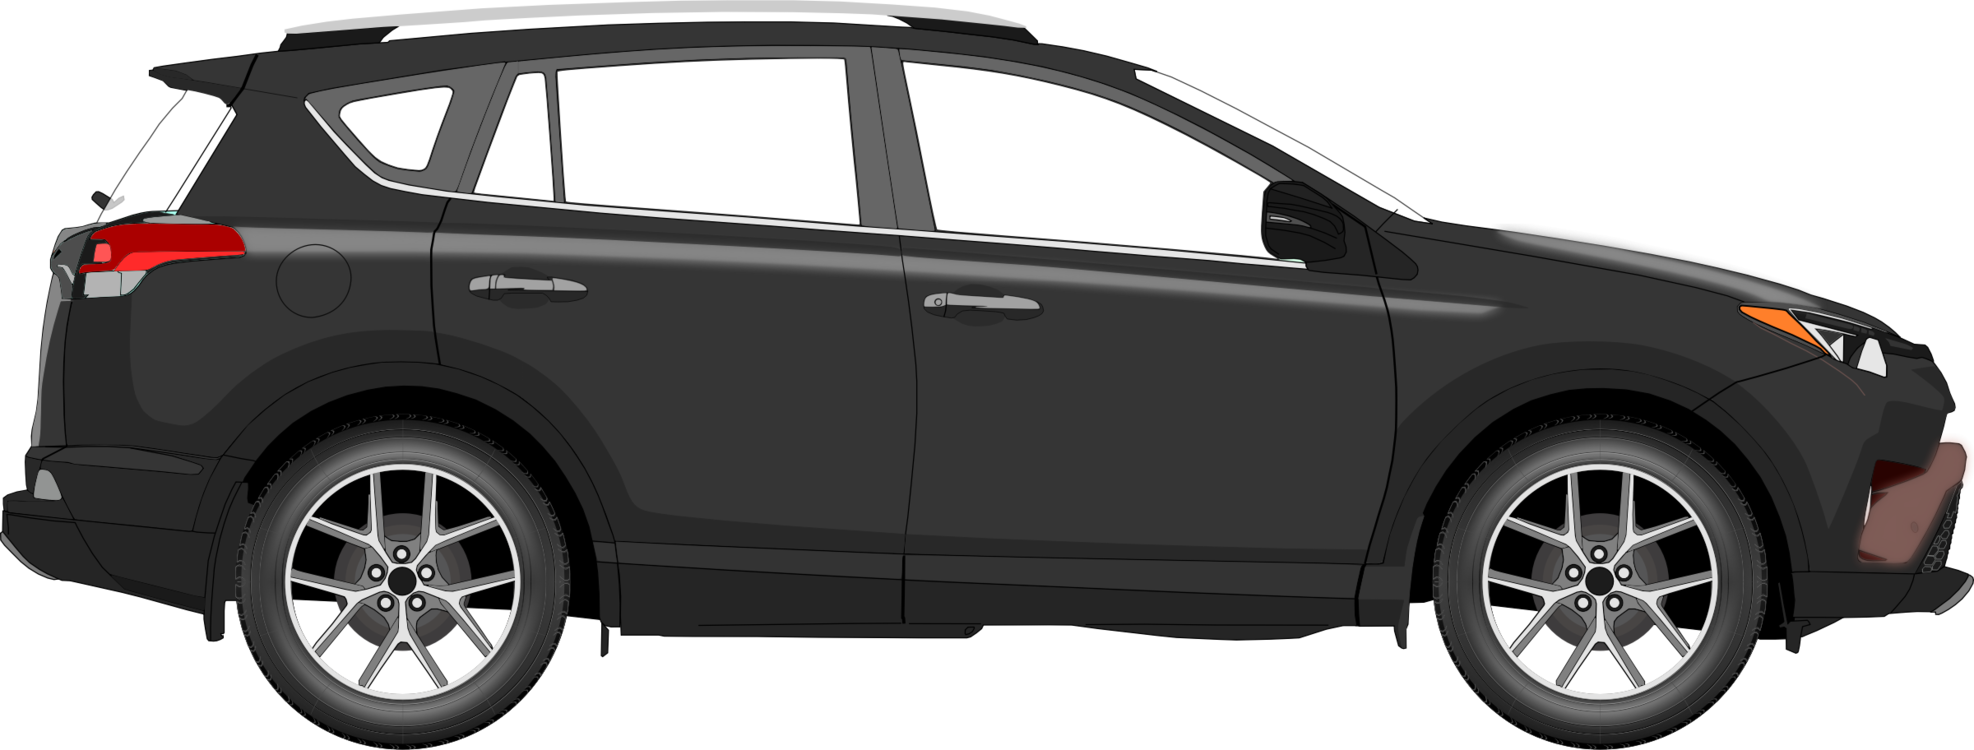 Compact Sport Utility Vehicle,Rim,Compact Mpv